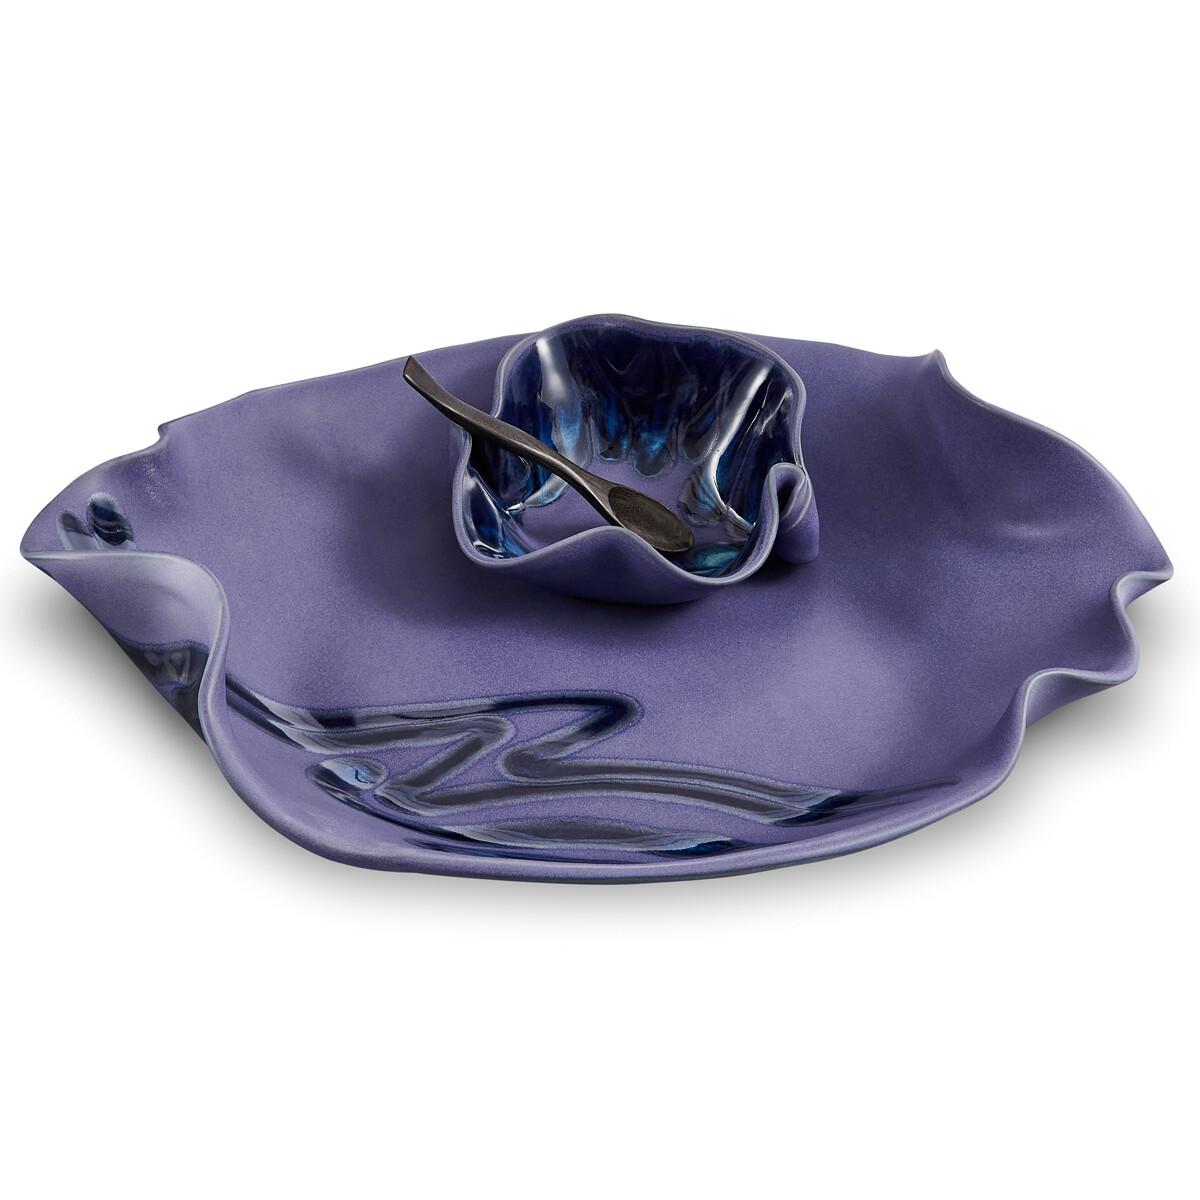 Hilborn Dip Set Lg- Periwinkle Blue